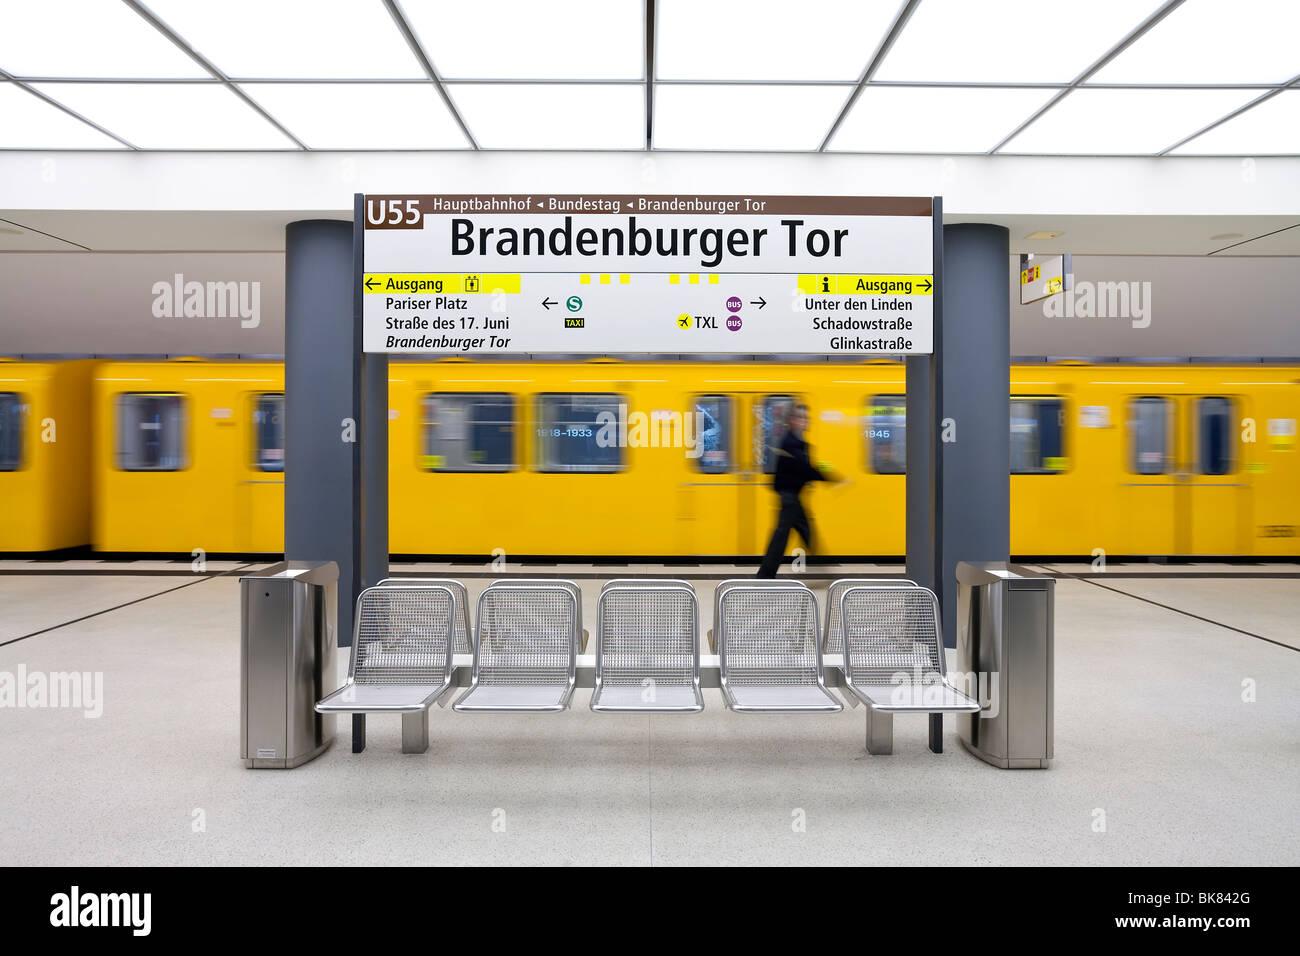 Europe, Germany, Berlin, modern futuristic style subway station - Stock Image